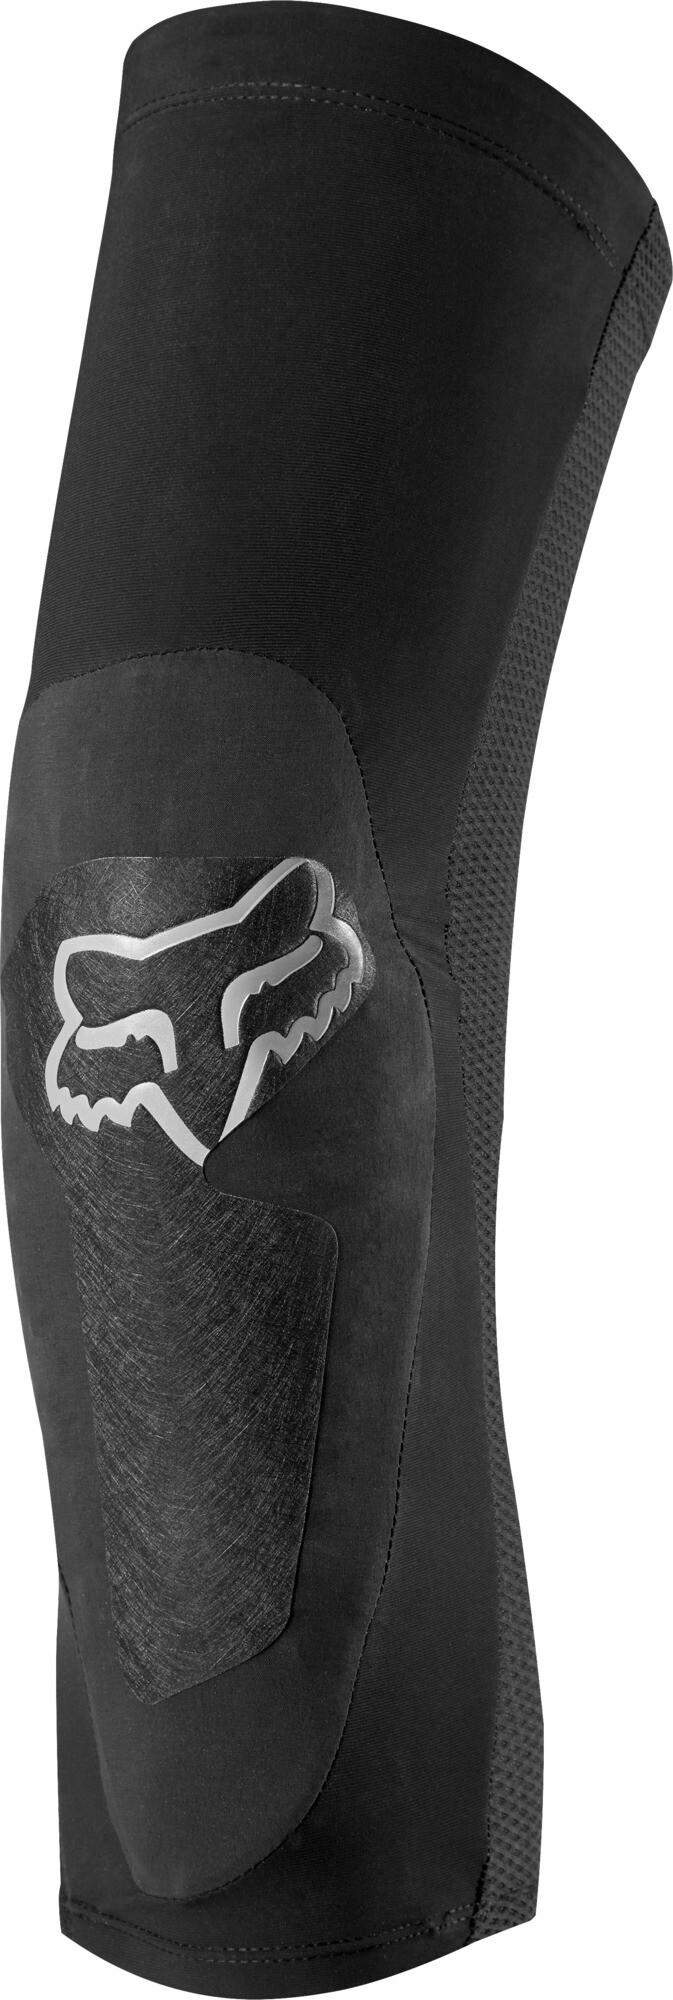 Fox Enduro Pro Knee Guard Black